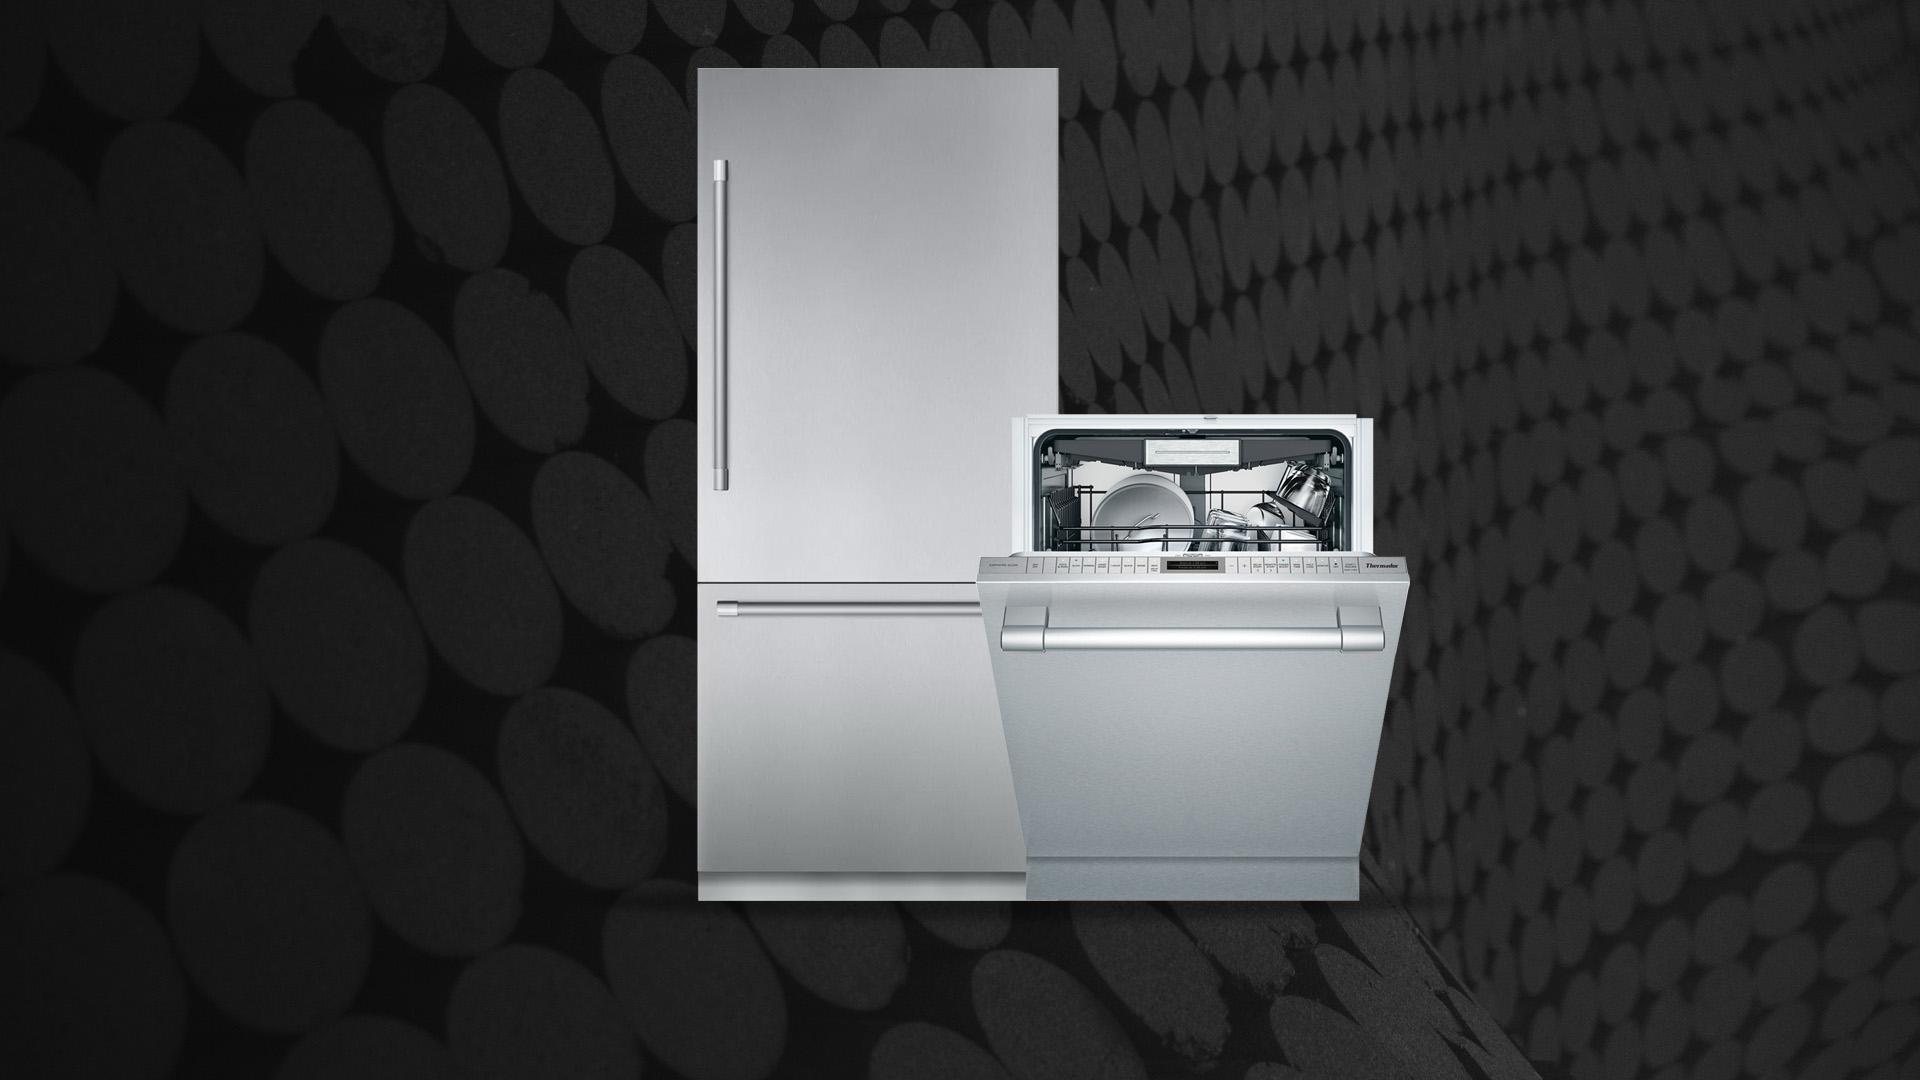 Thermador Appliance Repair Service Anaheim   Thermador Appliance Repair Pros